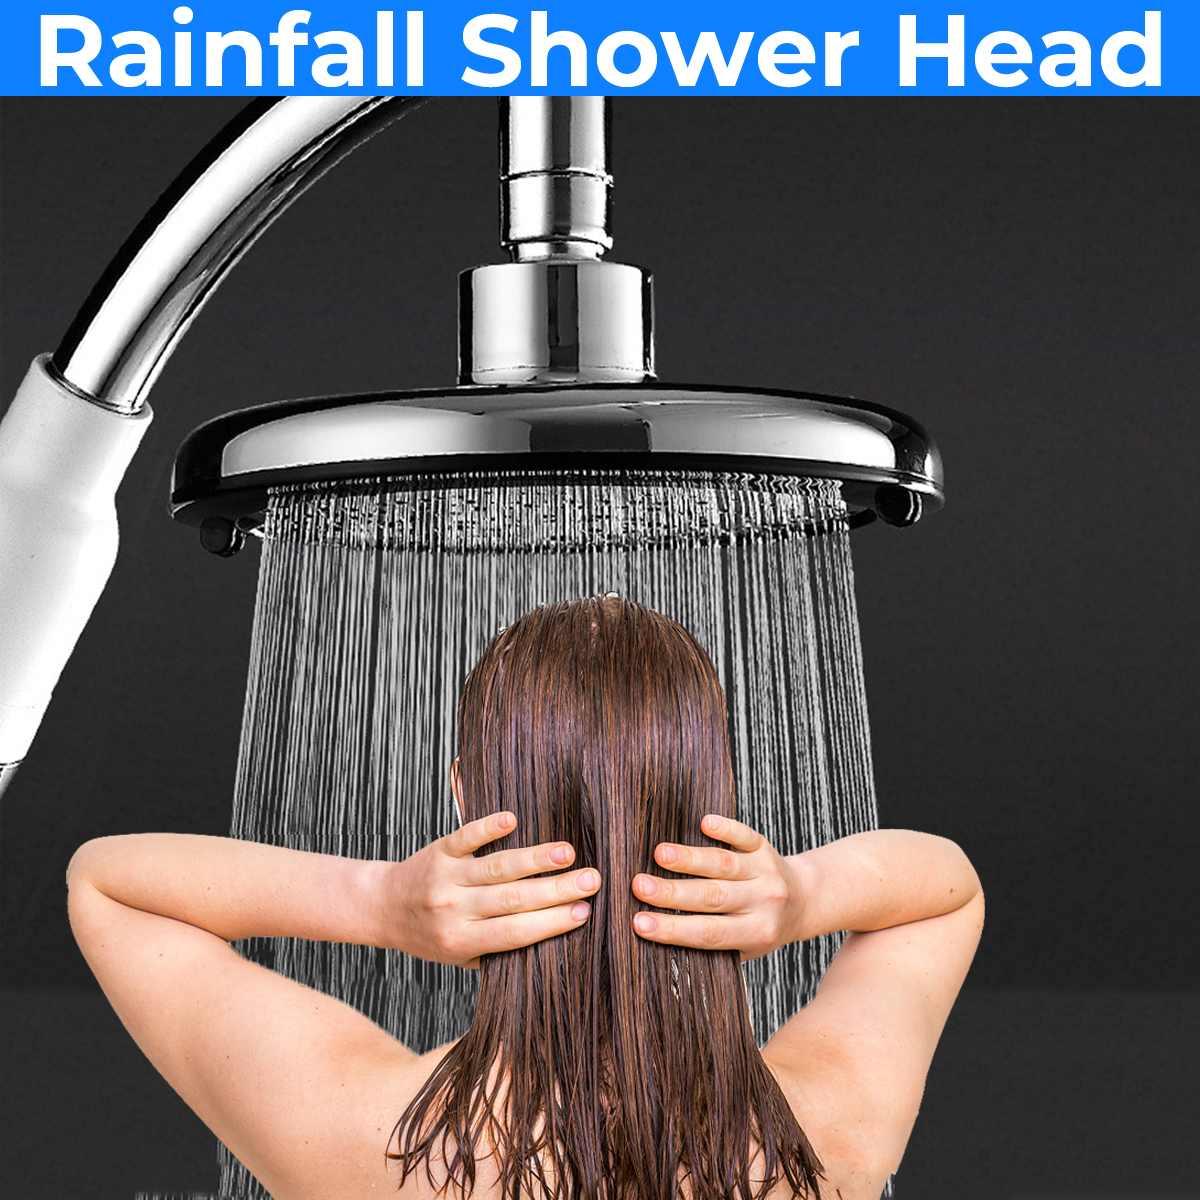 Bath Large Hand Shower Head Power Nozzle Hydromassage Pressure Boost Water Saving Big Rain Showerhea